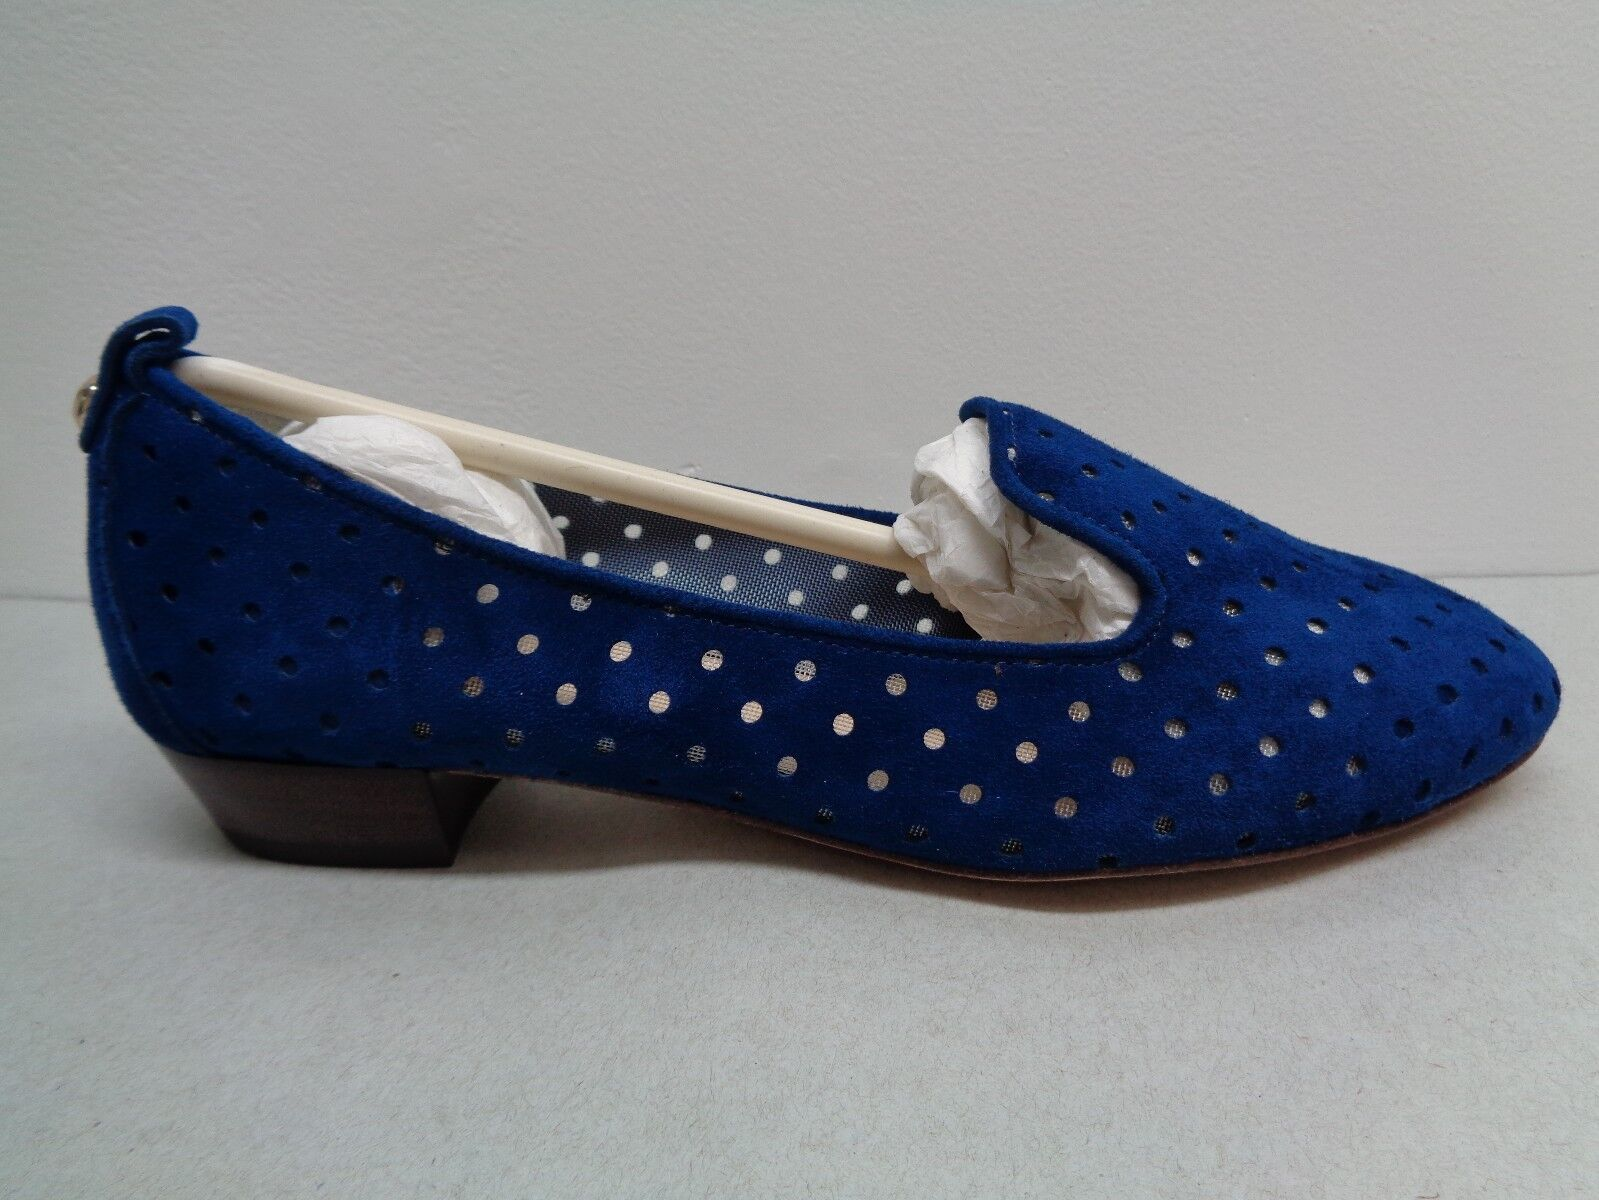 Vince Camuto Signature Größe 6 M New NADELLE Blau Suede Loafers New M Damenschuhe Schuhes d8e871